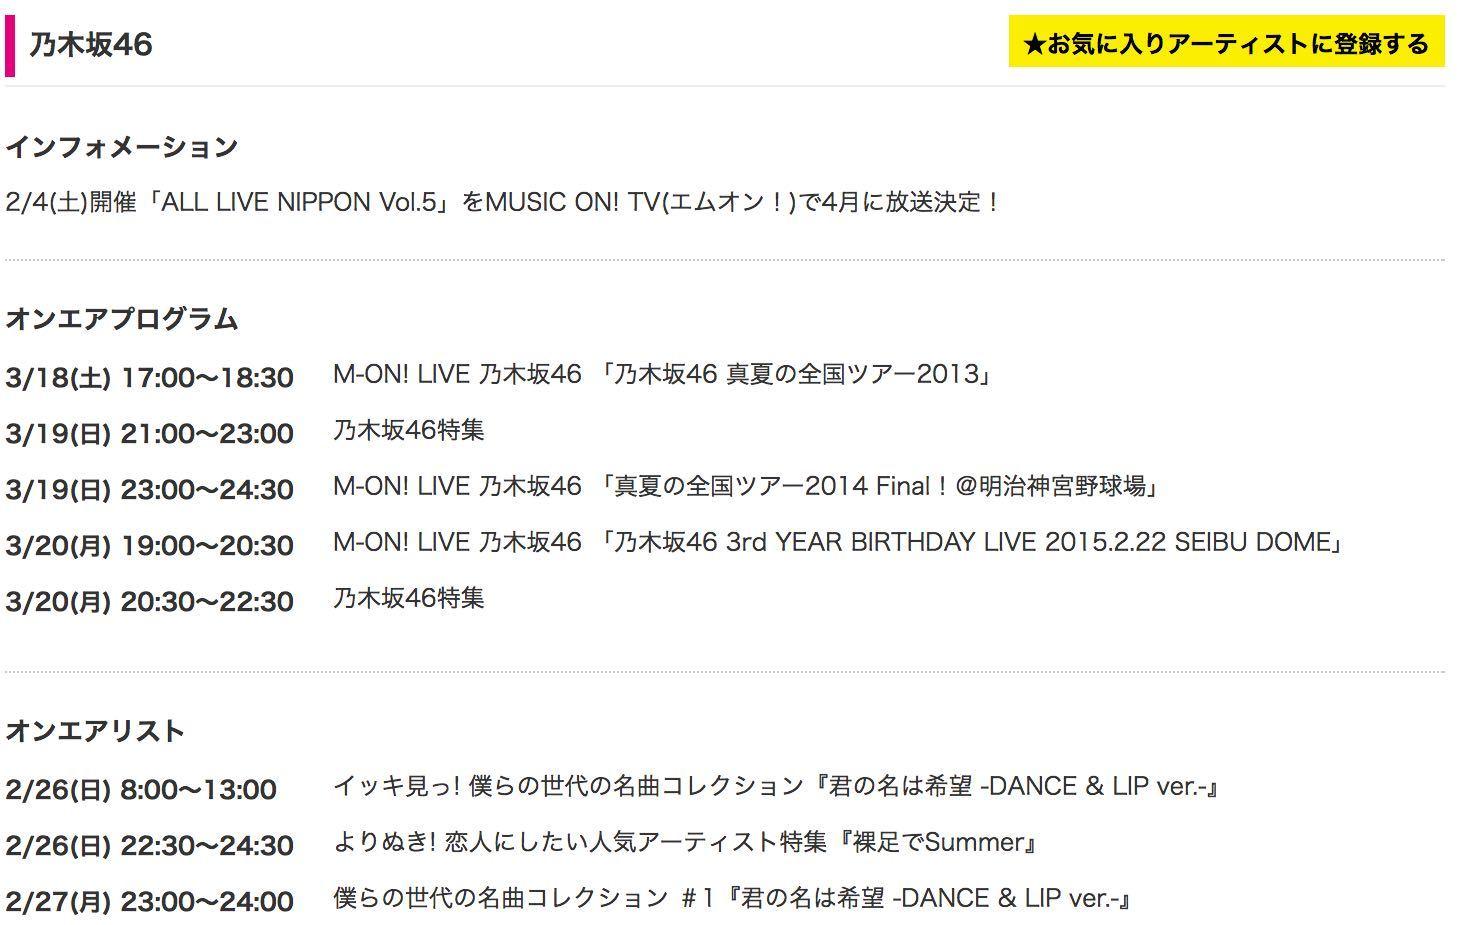 乃木坂46,3rd,YEAR,BIRTHDAY,LIVE,2015 SEIBU,DOME20170226